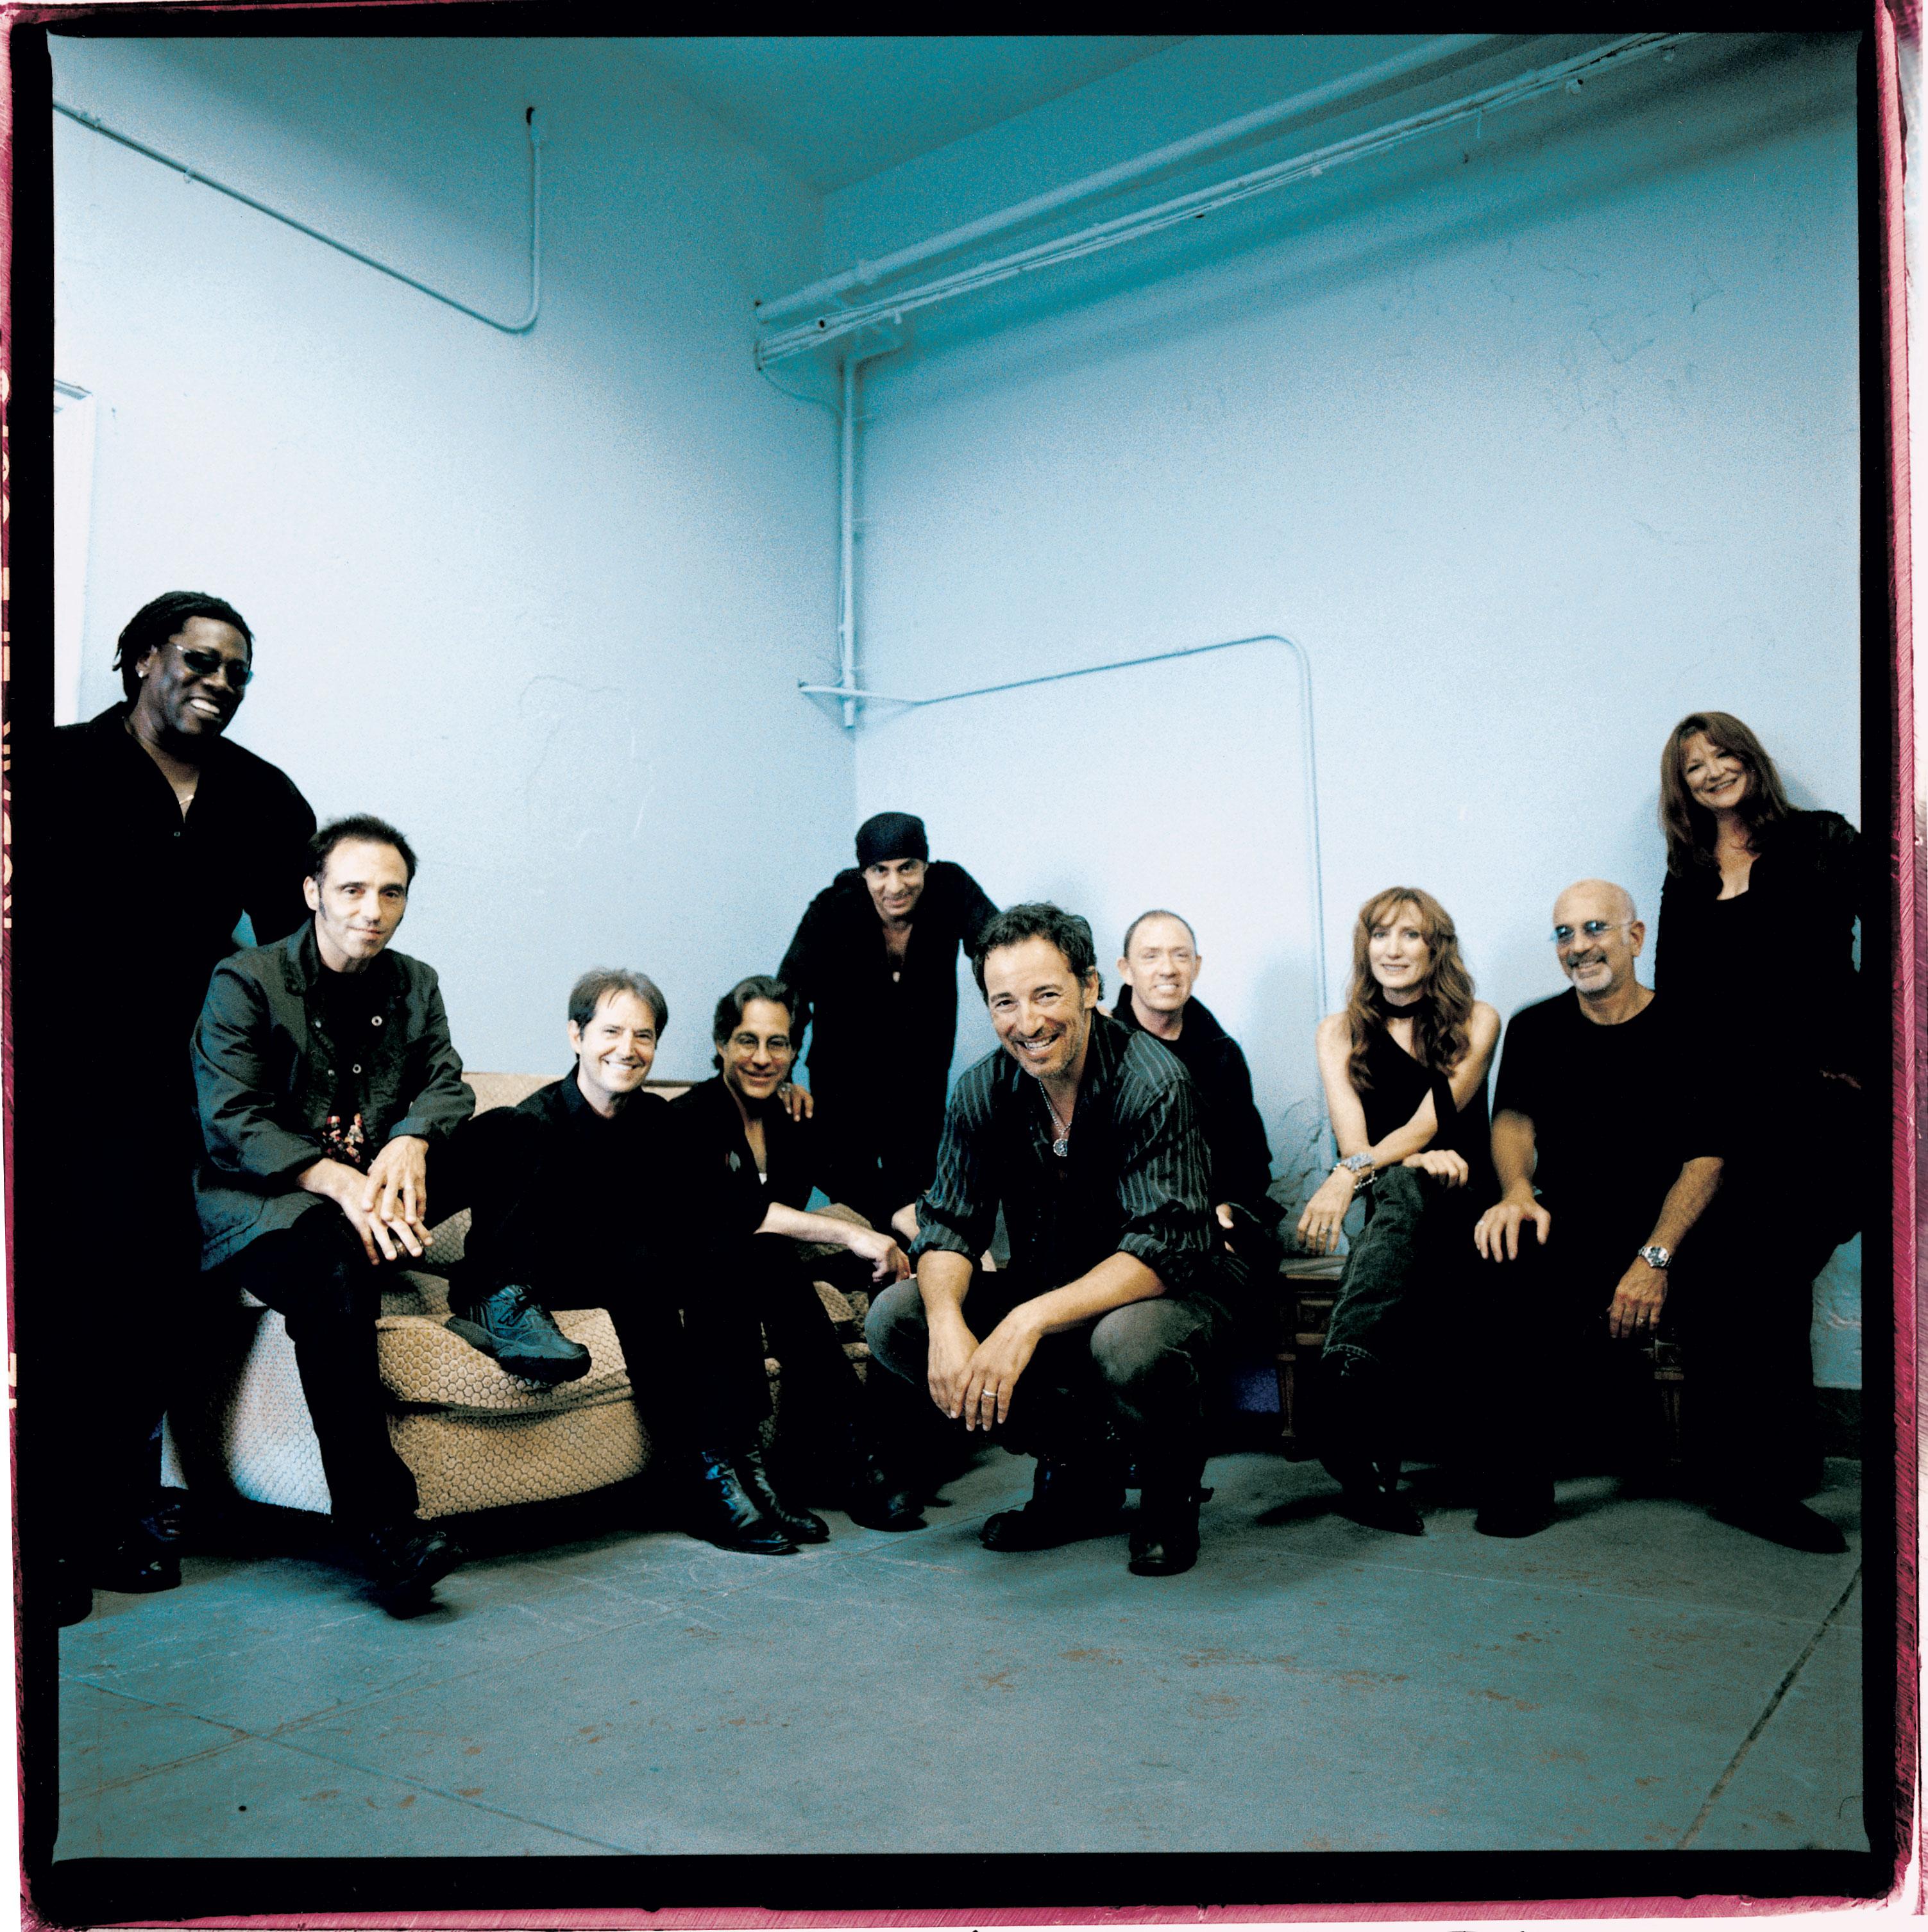 Plaat van de week: Bruce Springsteen & The E Street Band – 4th Of July, Asbury Park (Sandy)